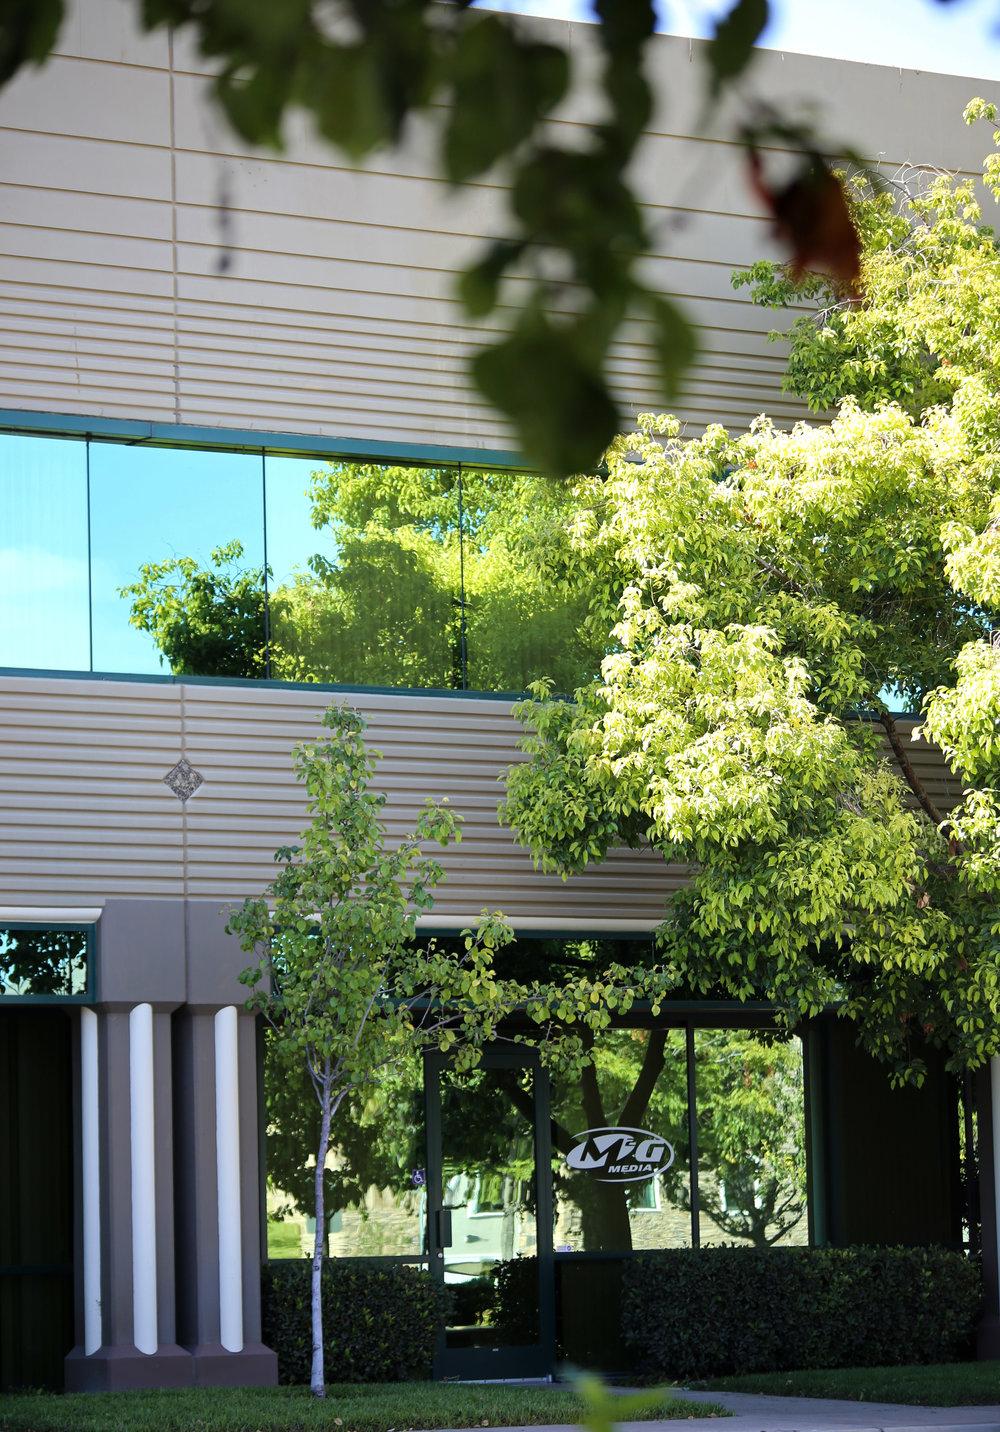 M2G Orchard VertMW2.jpg